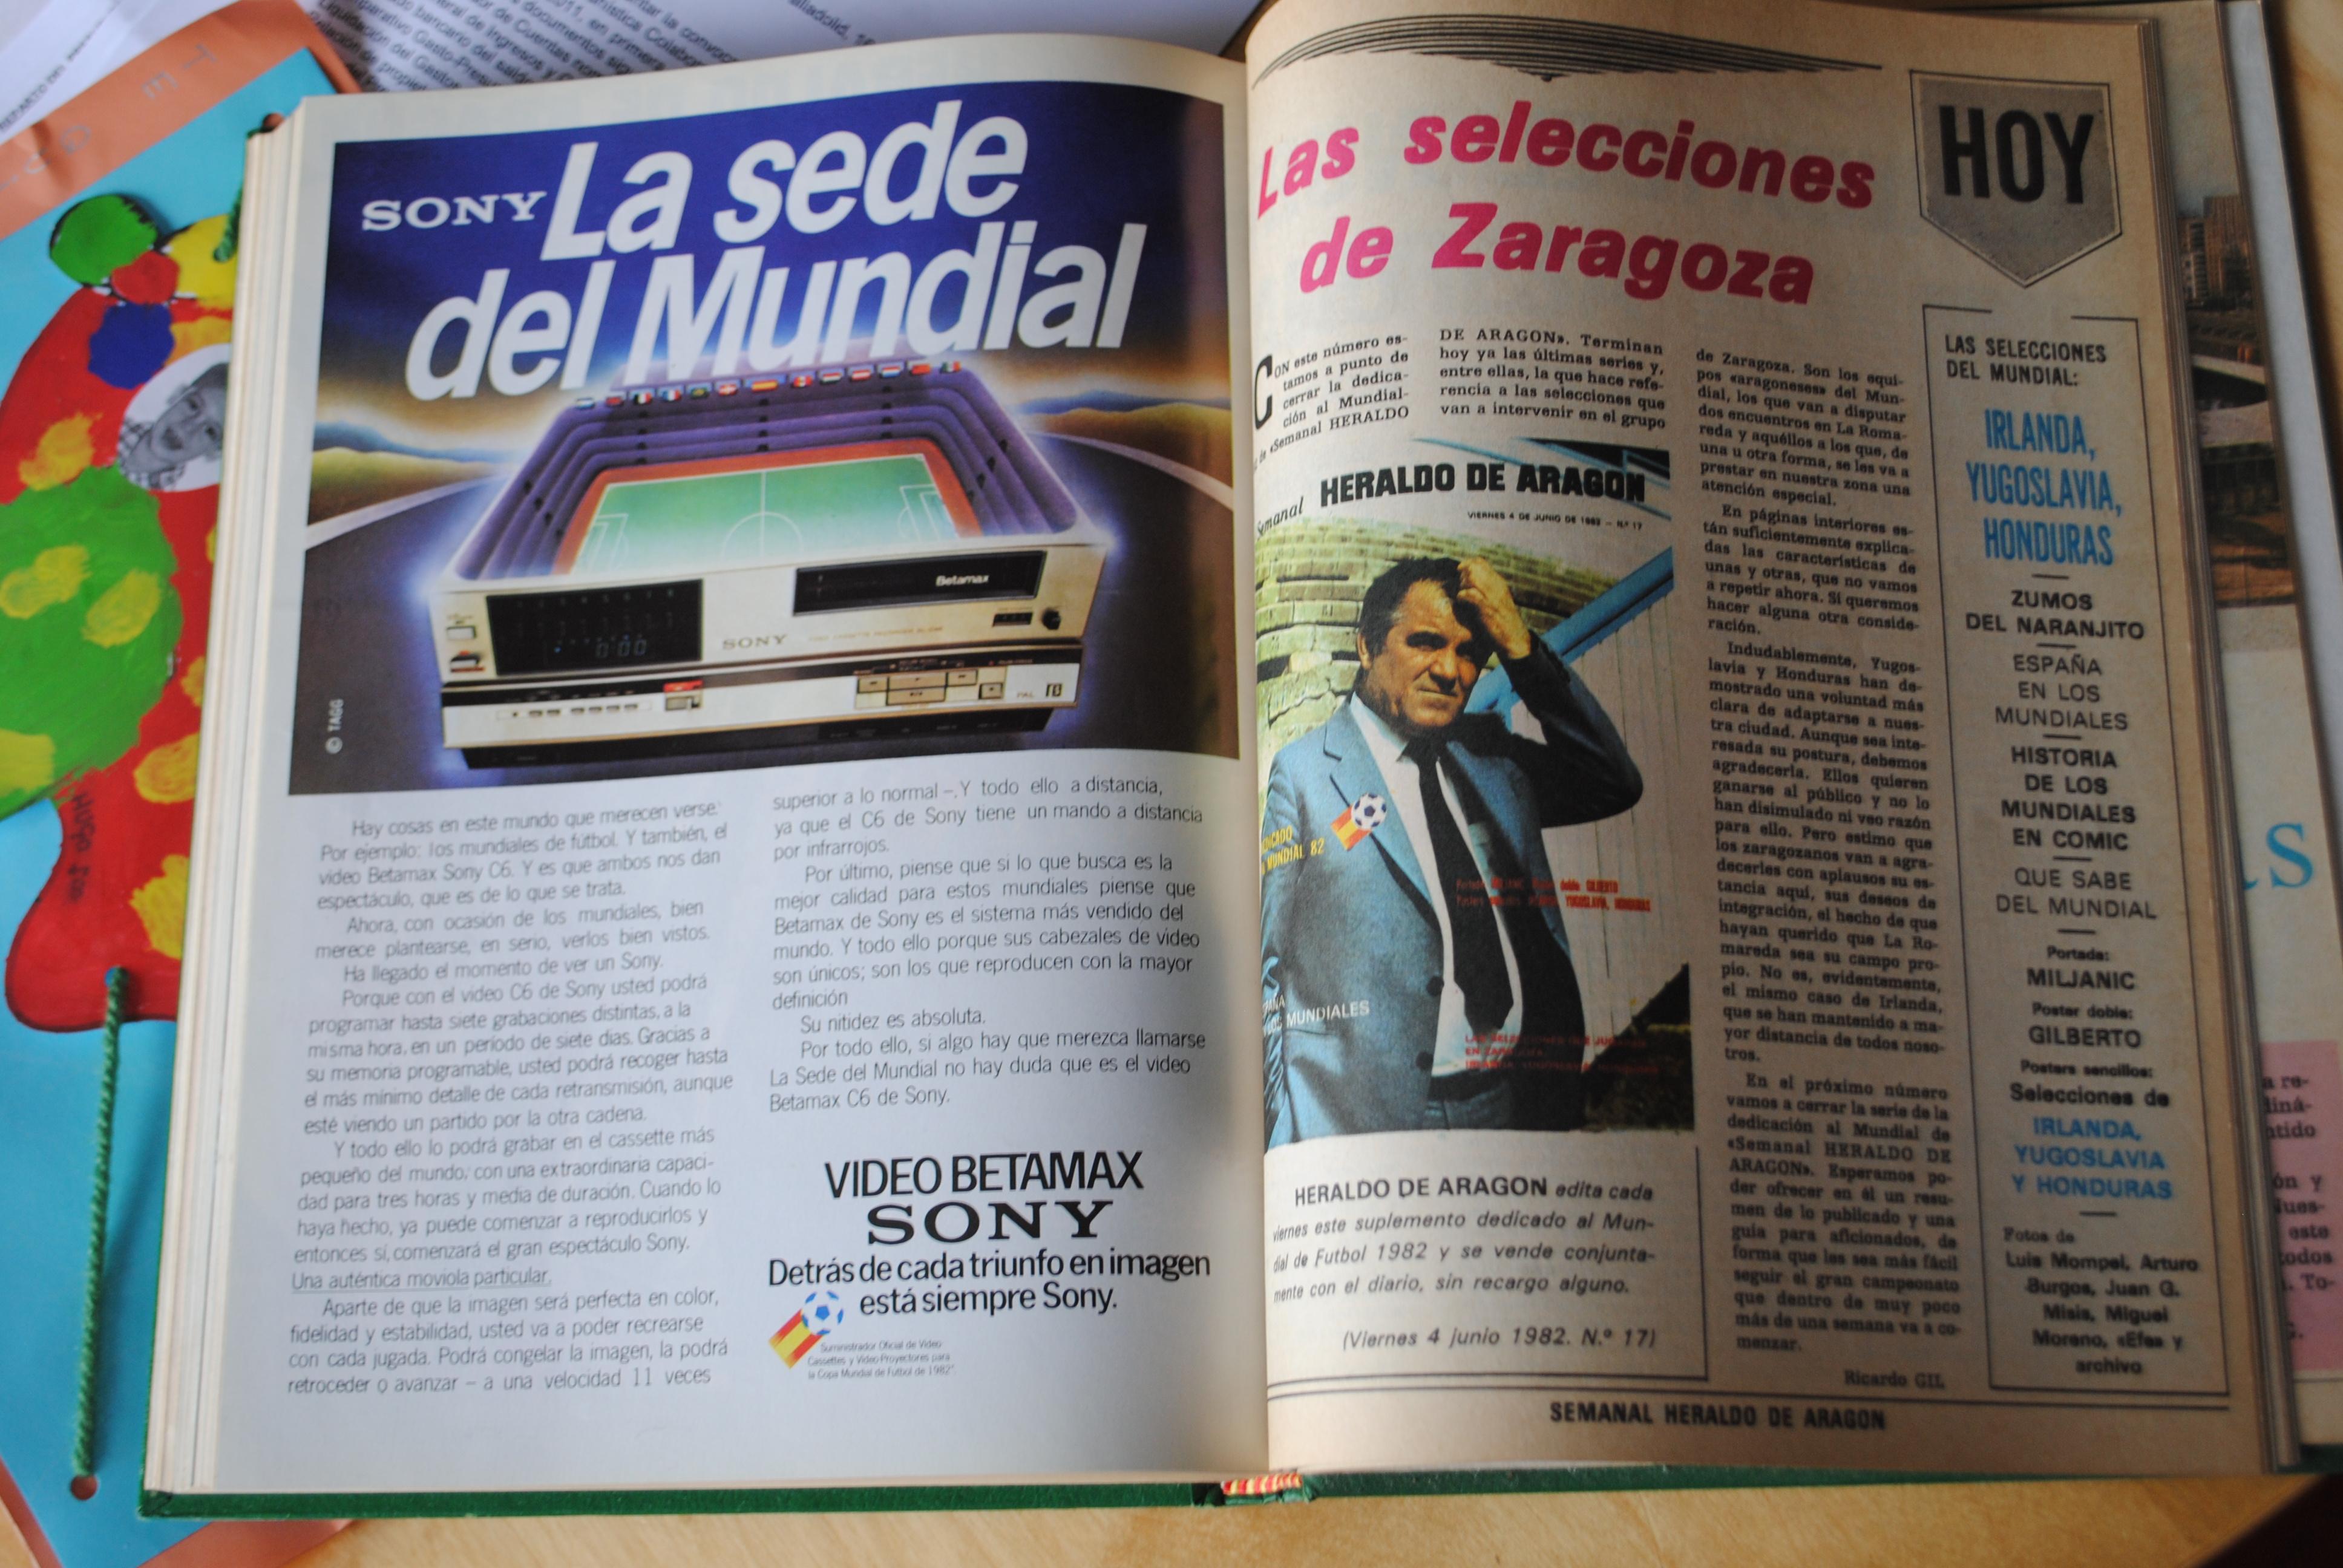 Coleccionismo deportivo: CAMPEONATO MUNDIAL DE FUTBOL 1982. HERALDO DE ARAGON. COMPLETO!!!!!!!!!! MUNDIAL 82 - Foto 7 - 27249749